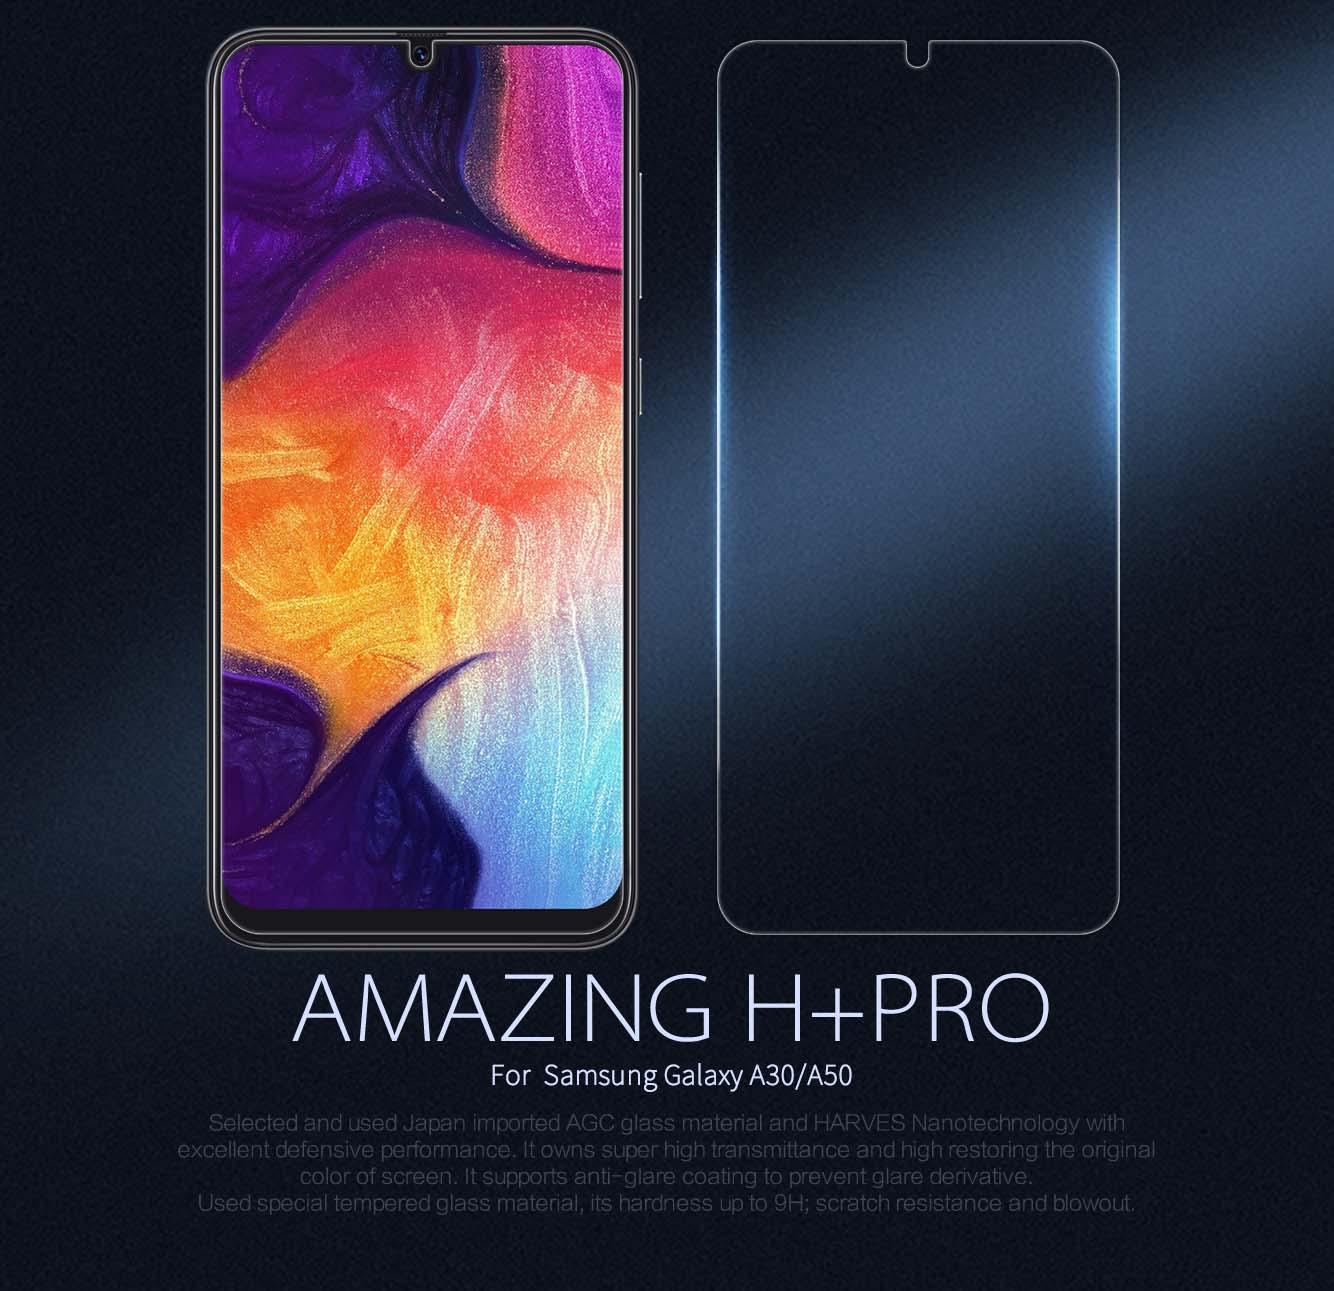 Samsung Galaxy A30 screen protector